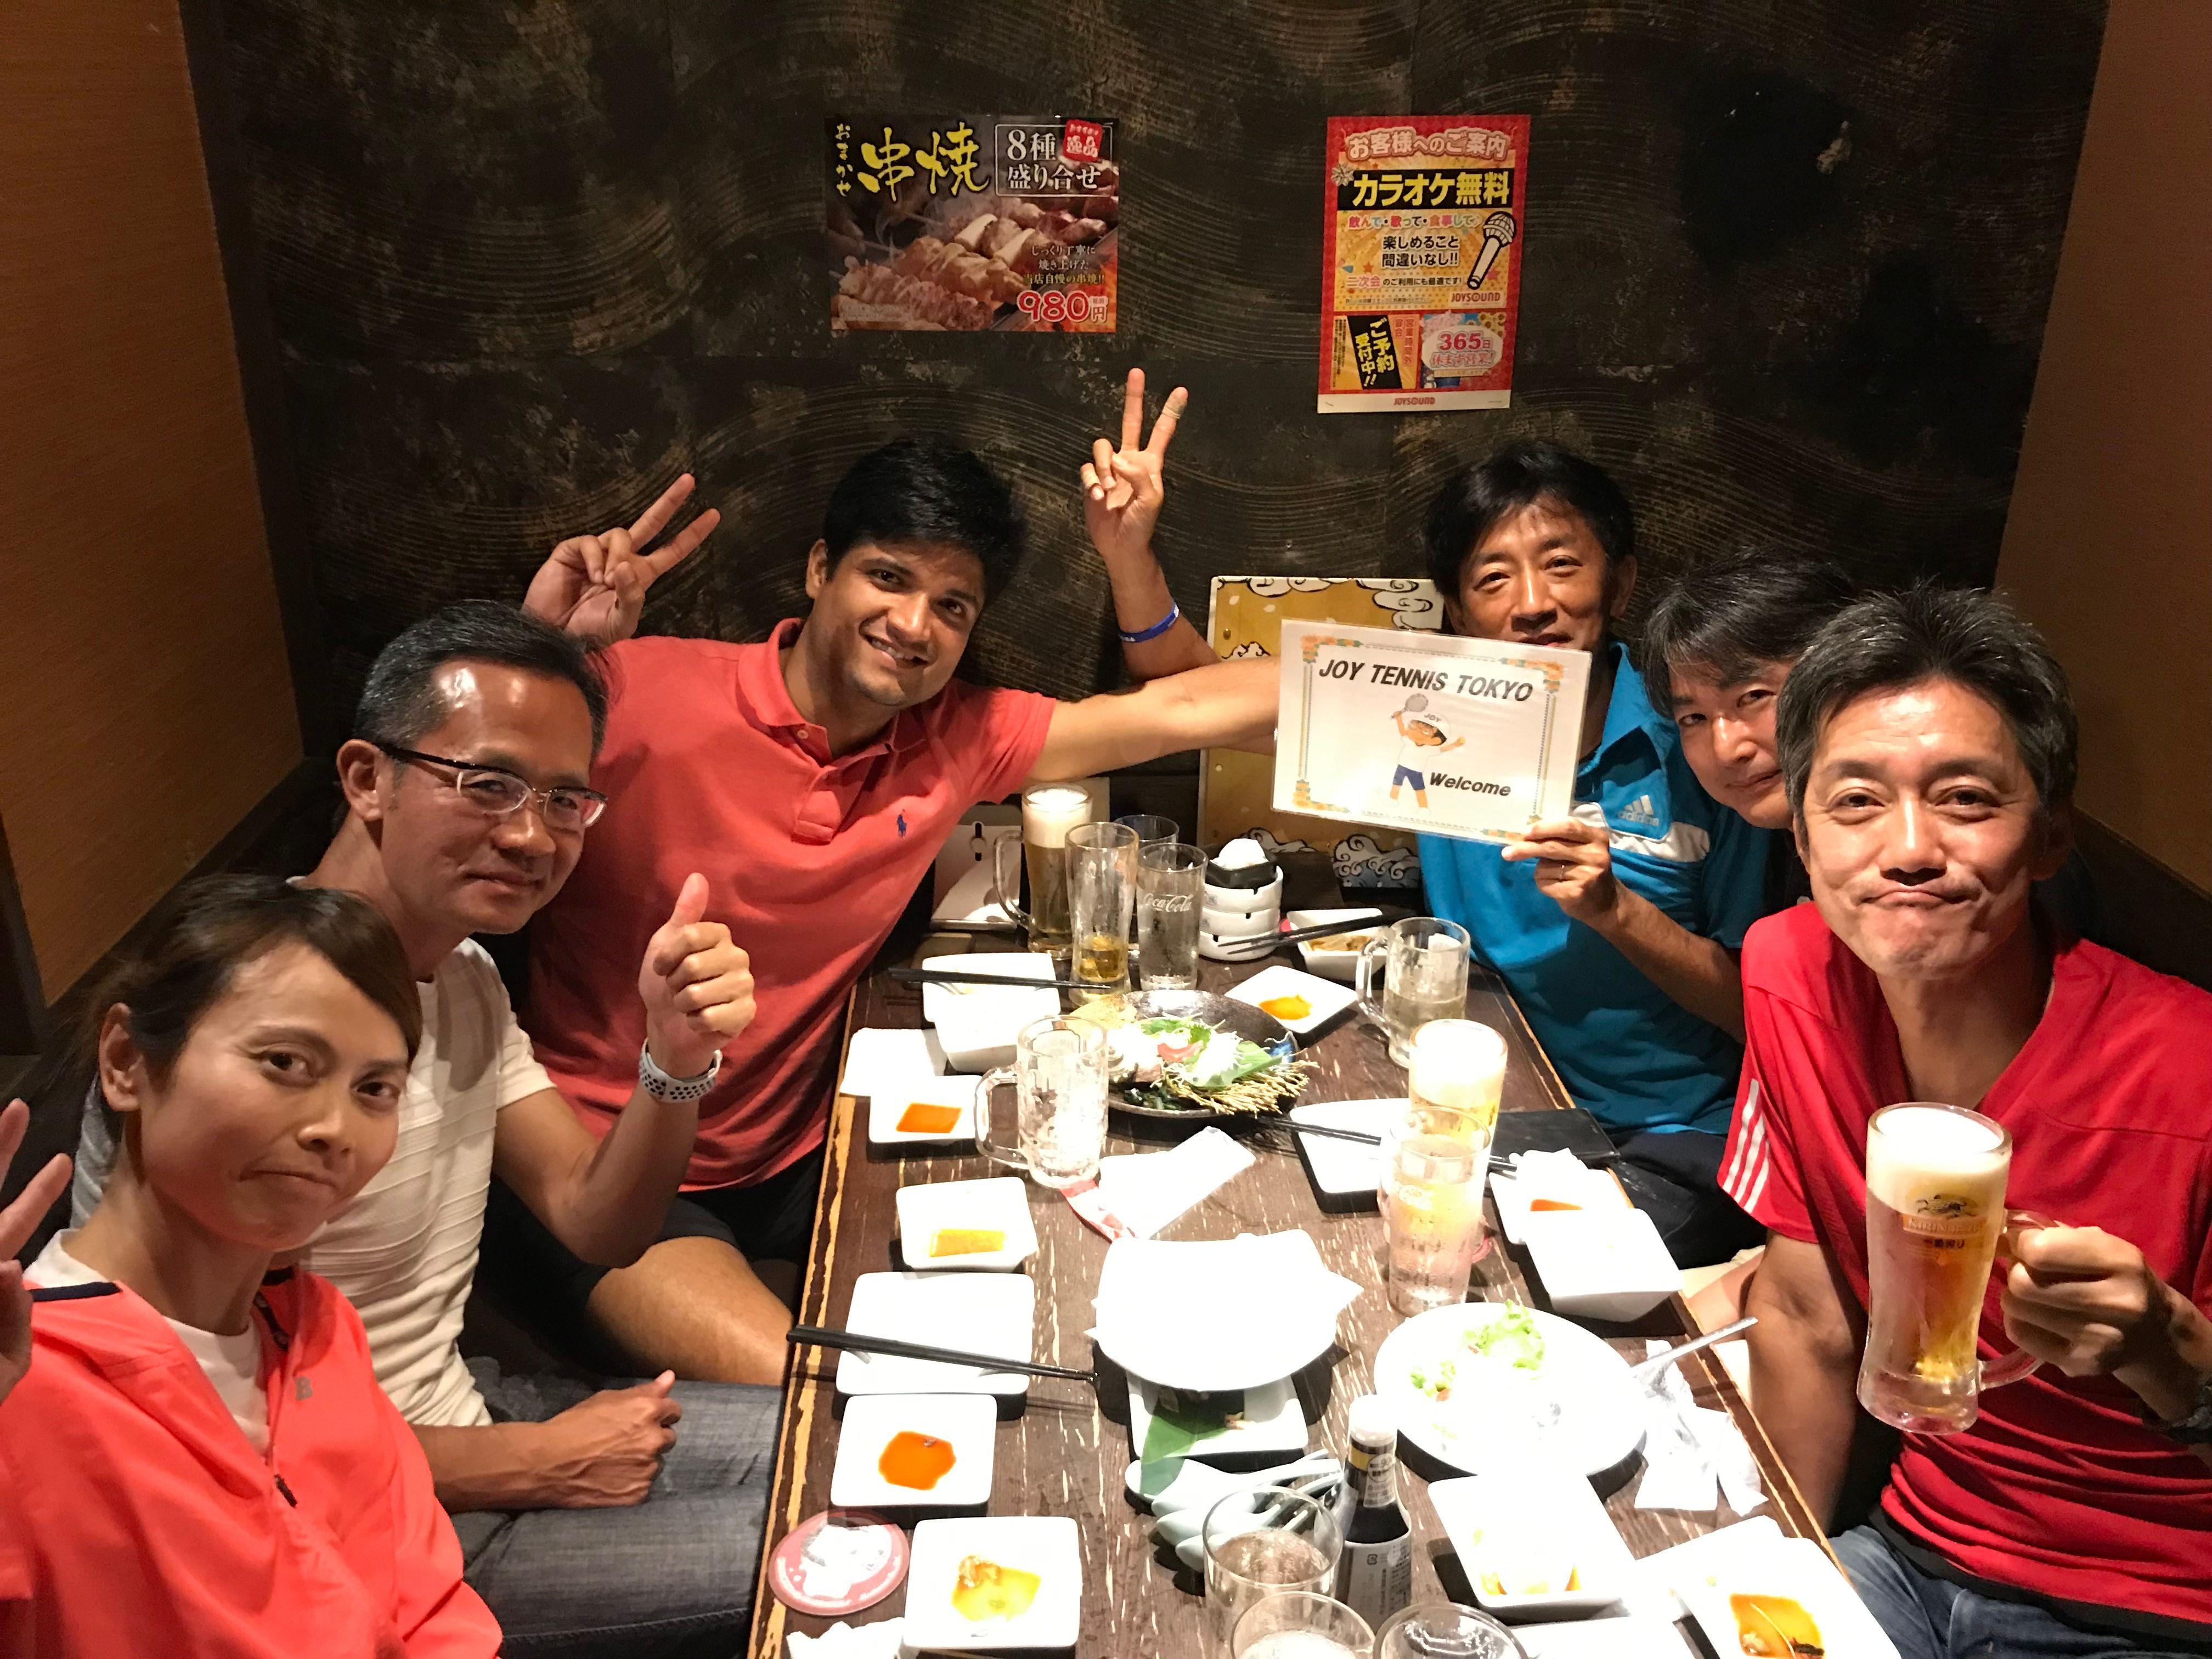 JOY TENNIS TOKYO